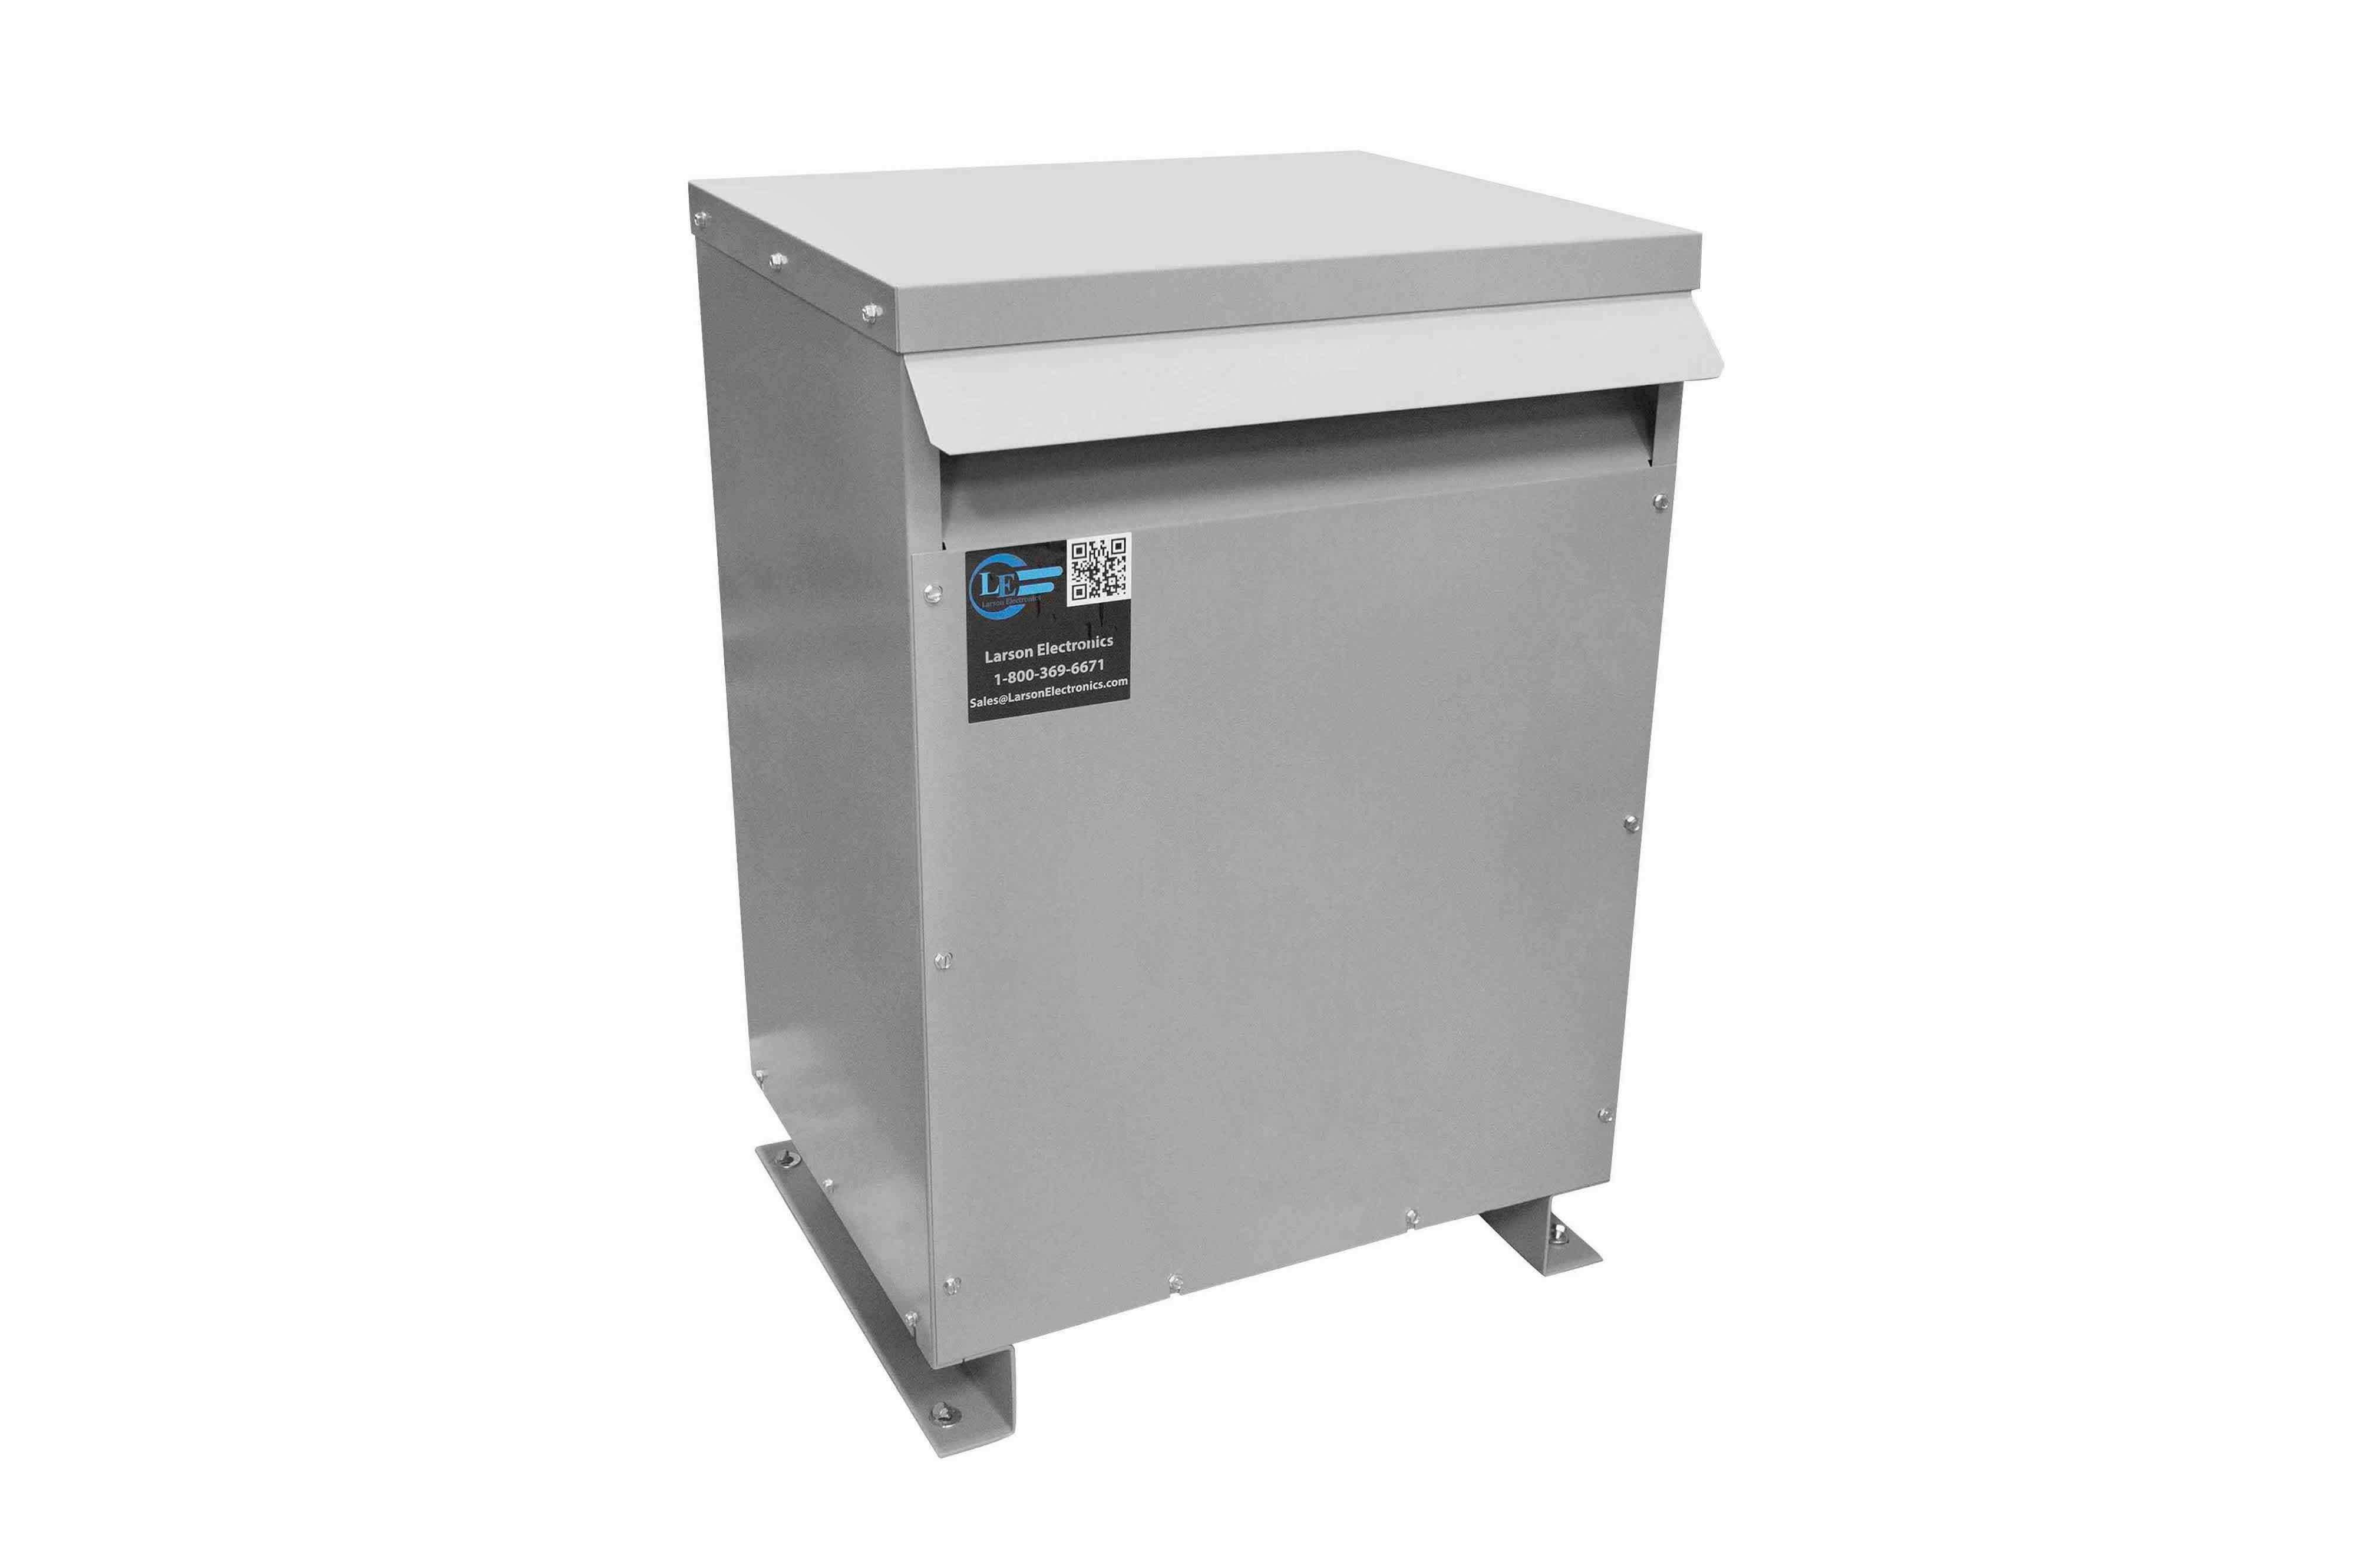 100 kVA 3PH Isolation Transformer, 240V Wye Primary, 415Y/240 Wye-N Secondary, N3R, Ventilated, 60 Hz